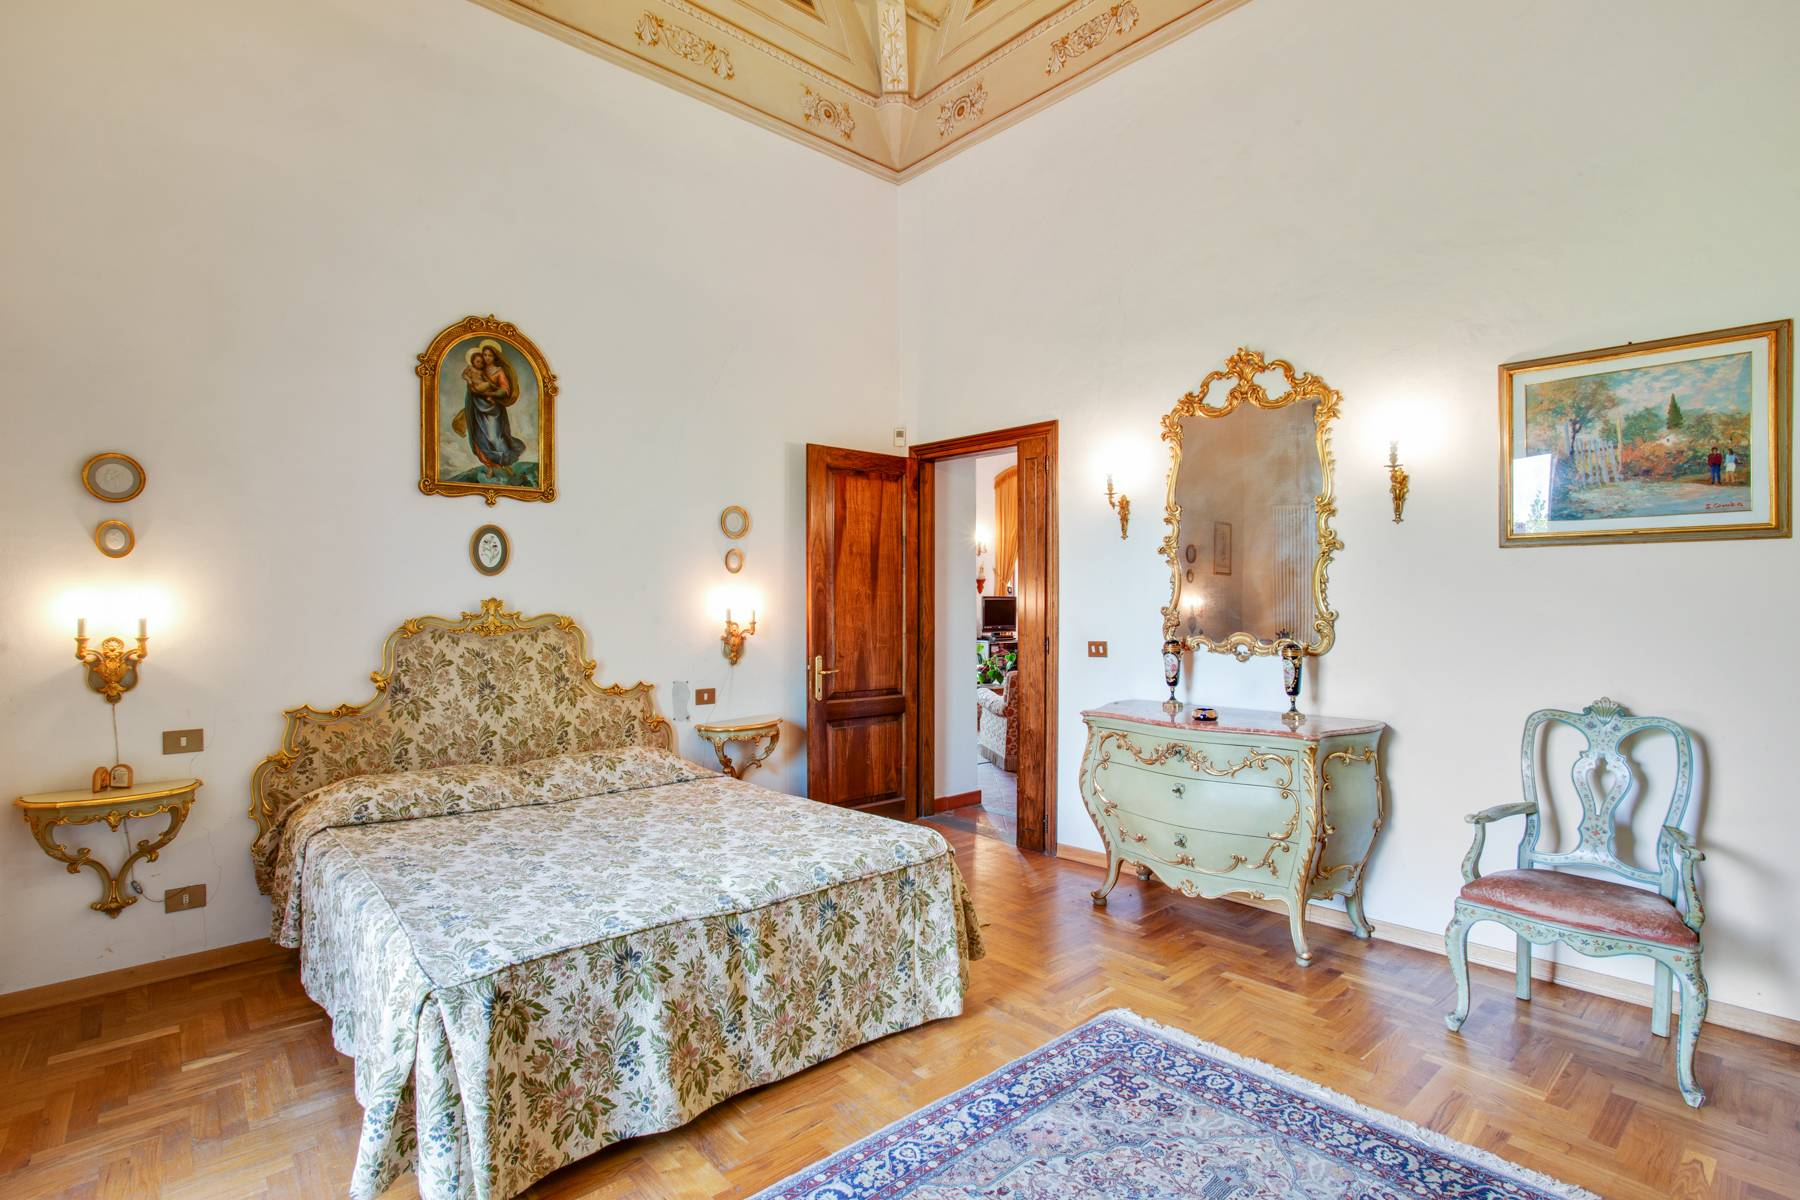 Appartamento in Vendita a Scandicci: 5 locali, 170 mq - Foto 11